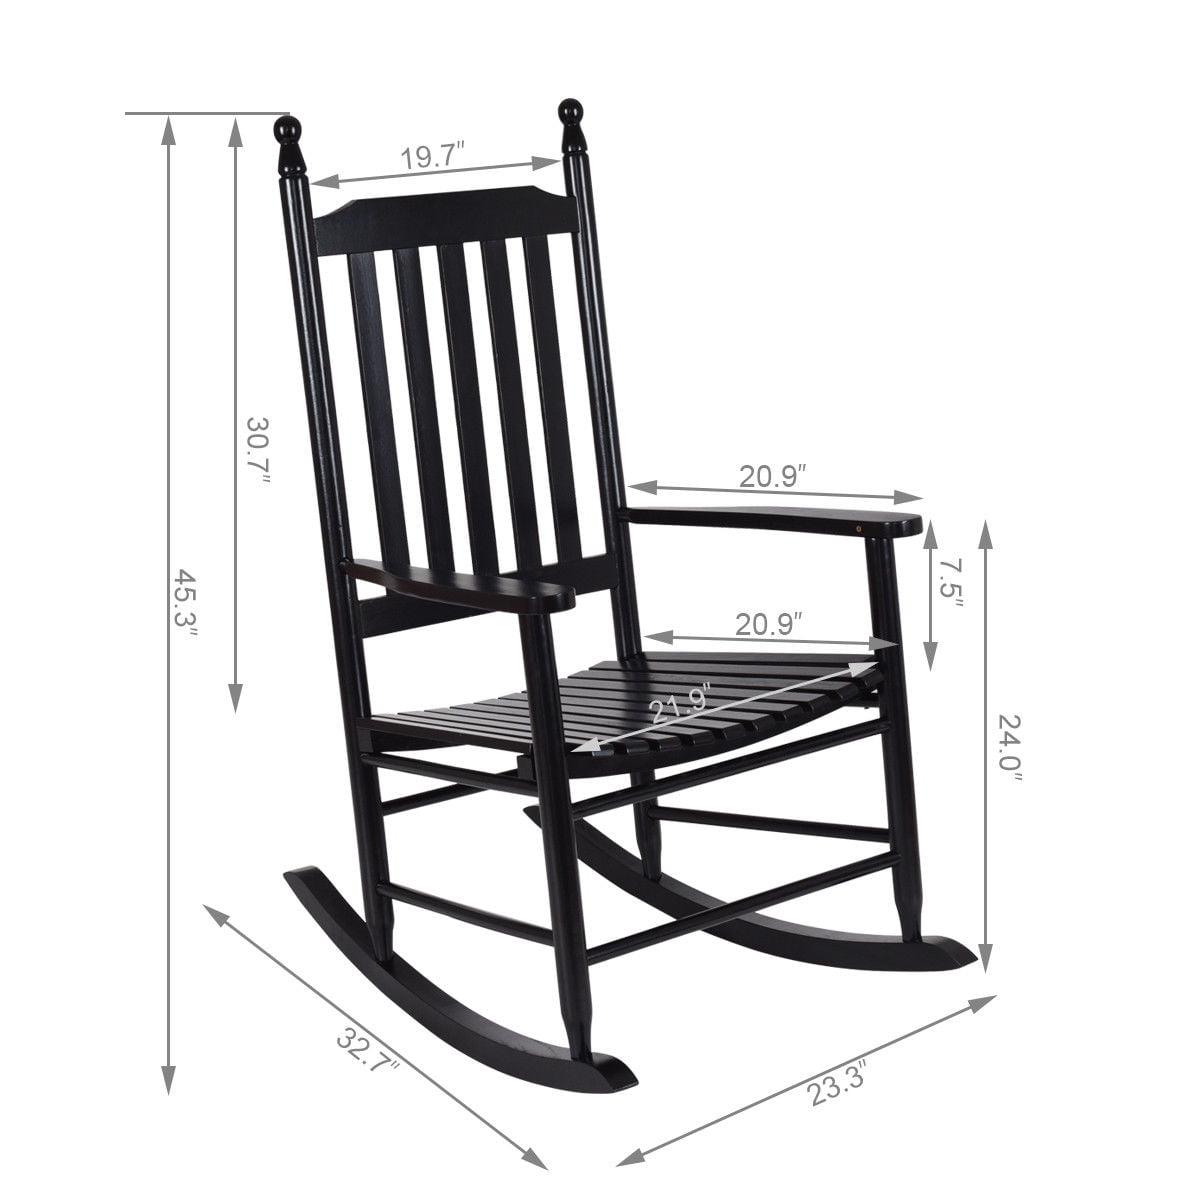 Gymax Wooden Rocking Chair Porch Rocker Armchair Balcony Deck Garden Furniture Black - image 3 of 8